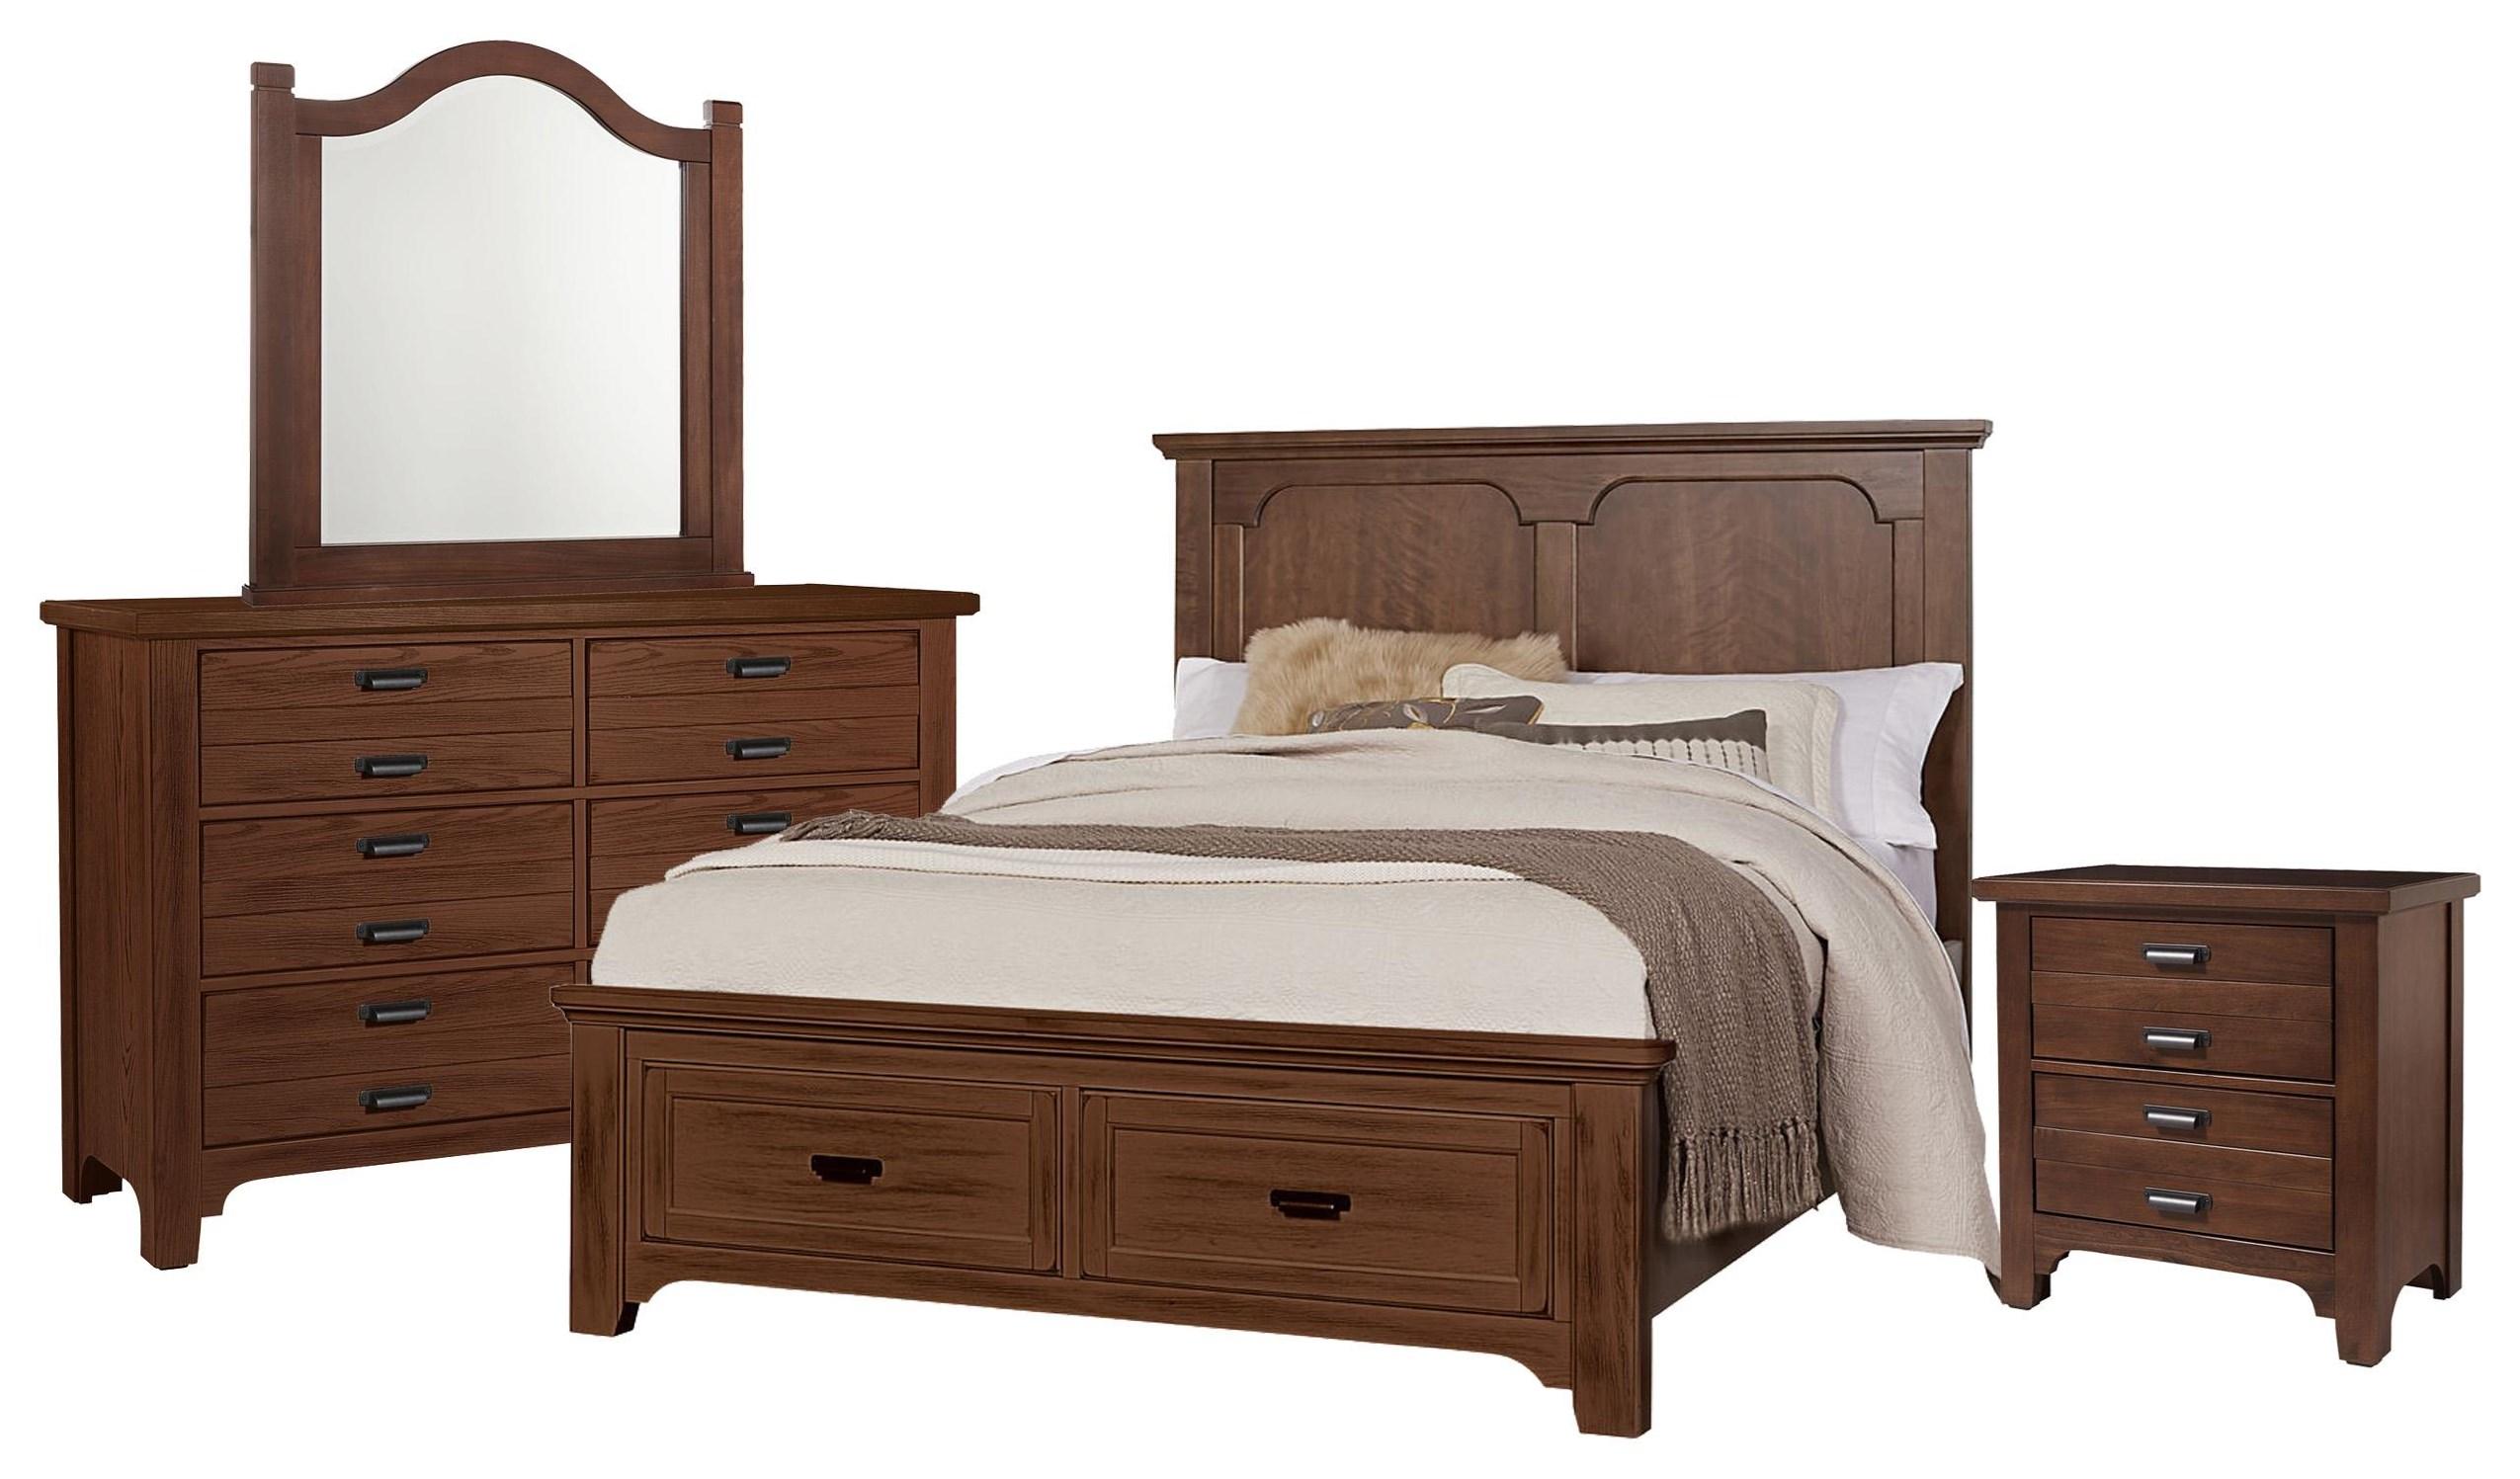 Queen Panel Storage Bed, Dresser, Mirror, Ni